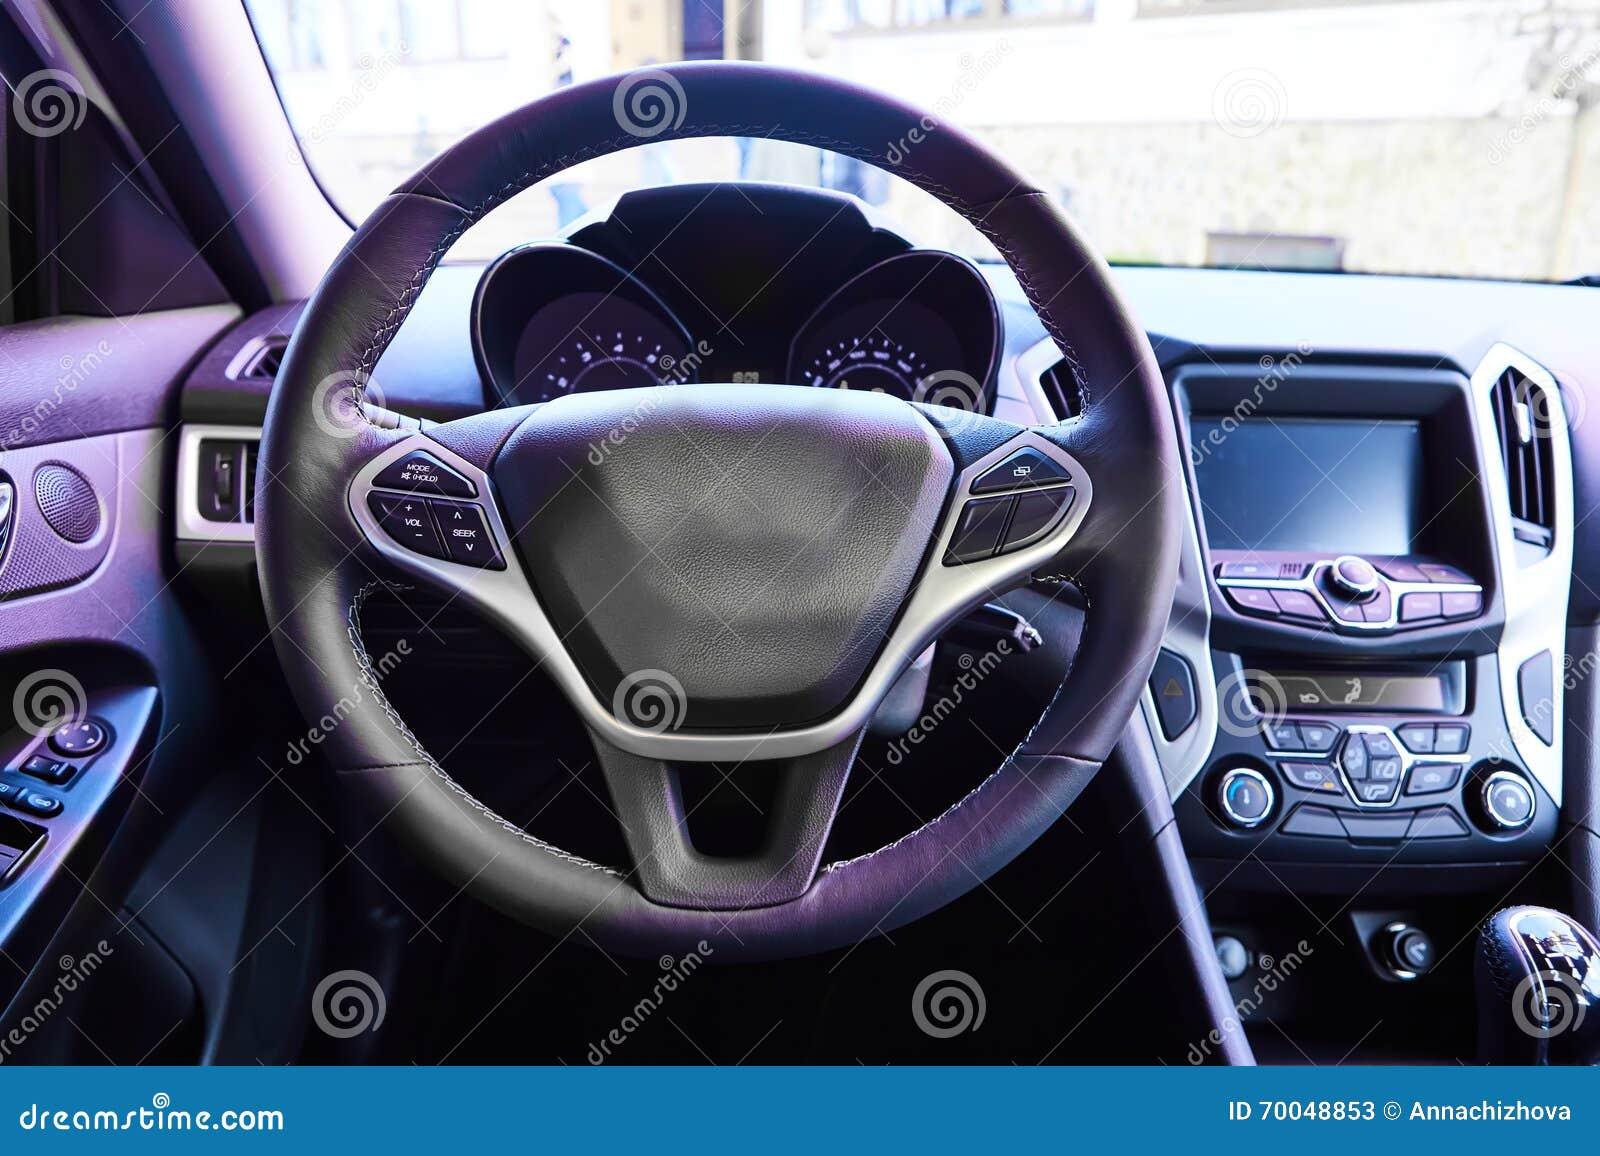 car interior view stock image 72159703. Black Bedroom Furniture Sets. Home Design Ideas